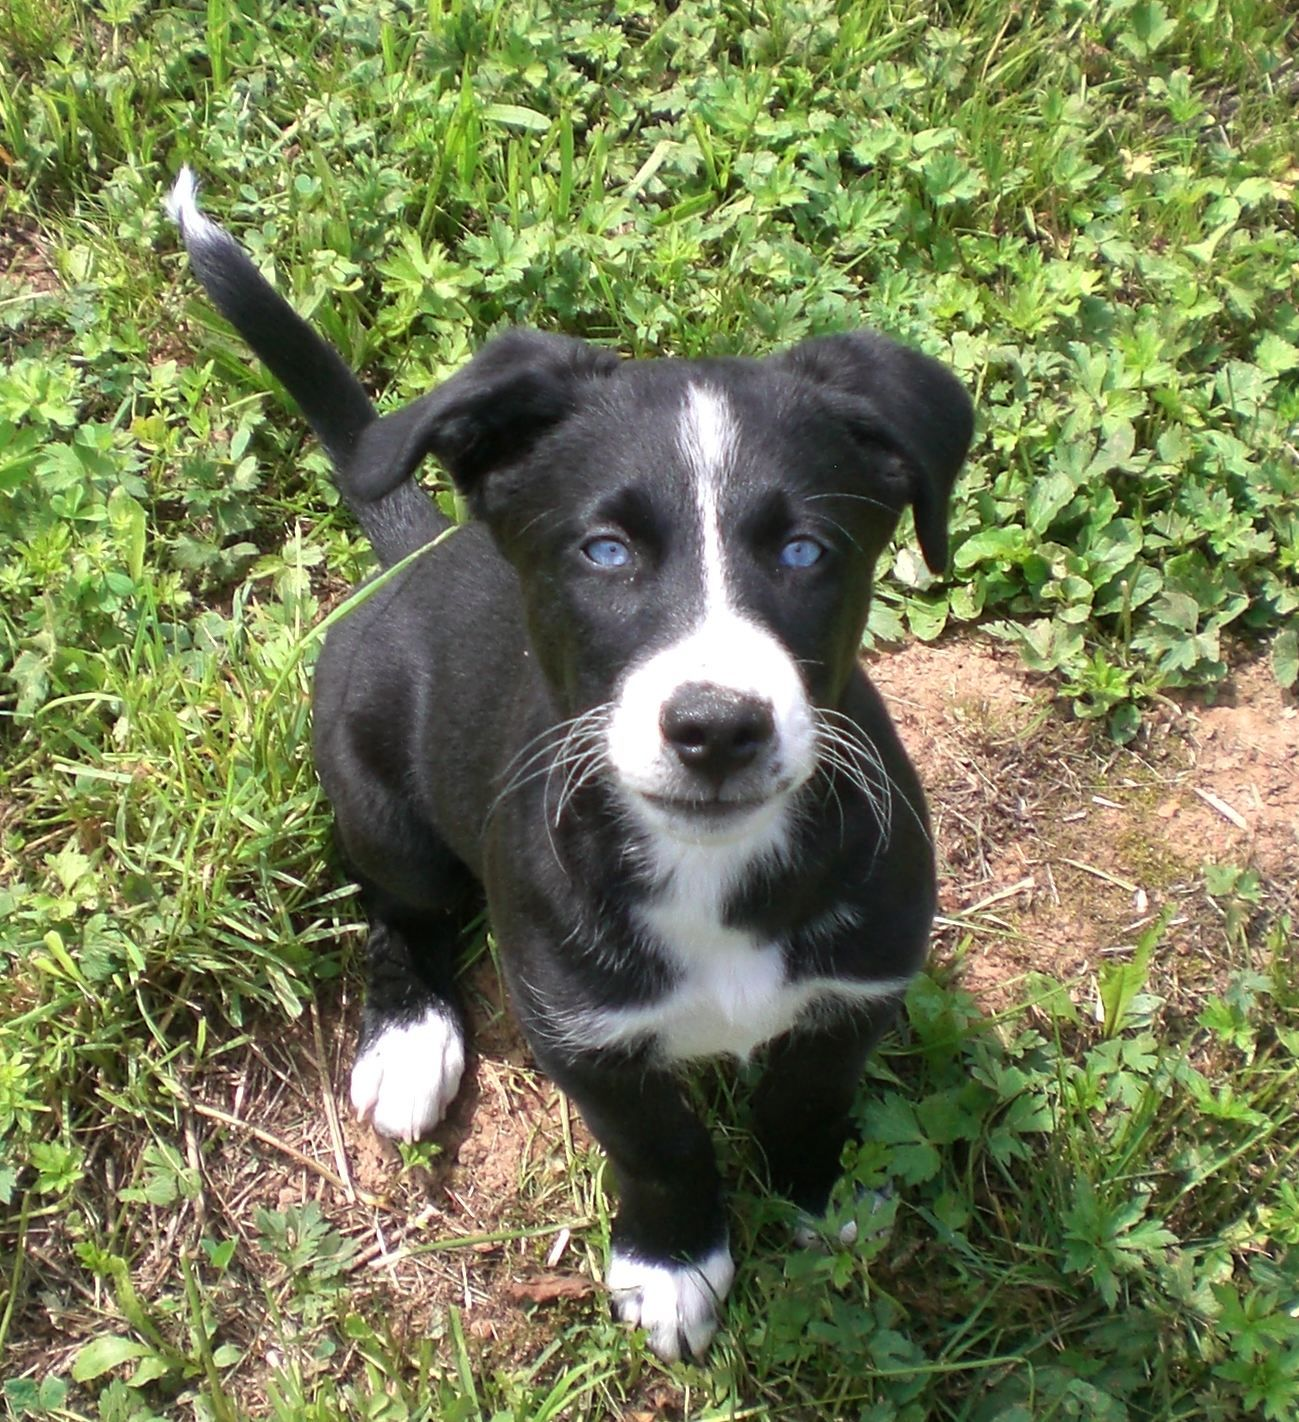 Lillifee Amerikanischer Staffordshire Terrier Labrador Siberian Husky Mischling Mix Pitbull Mischling Terrier Mischling Hundebabys